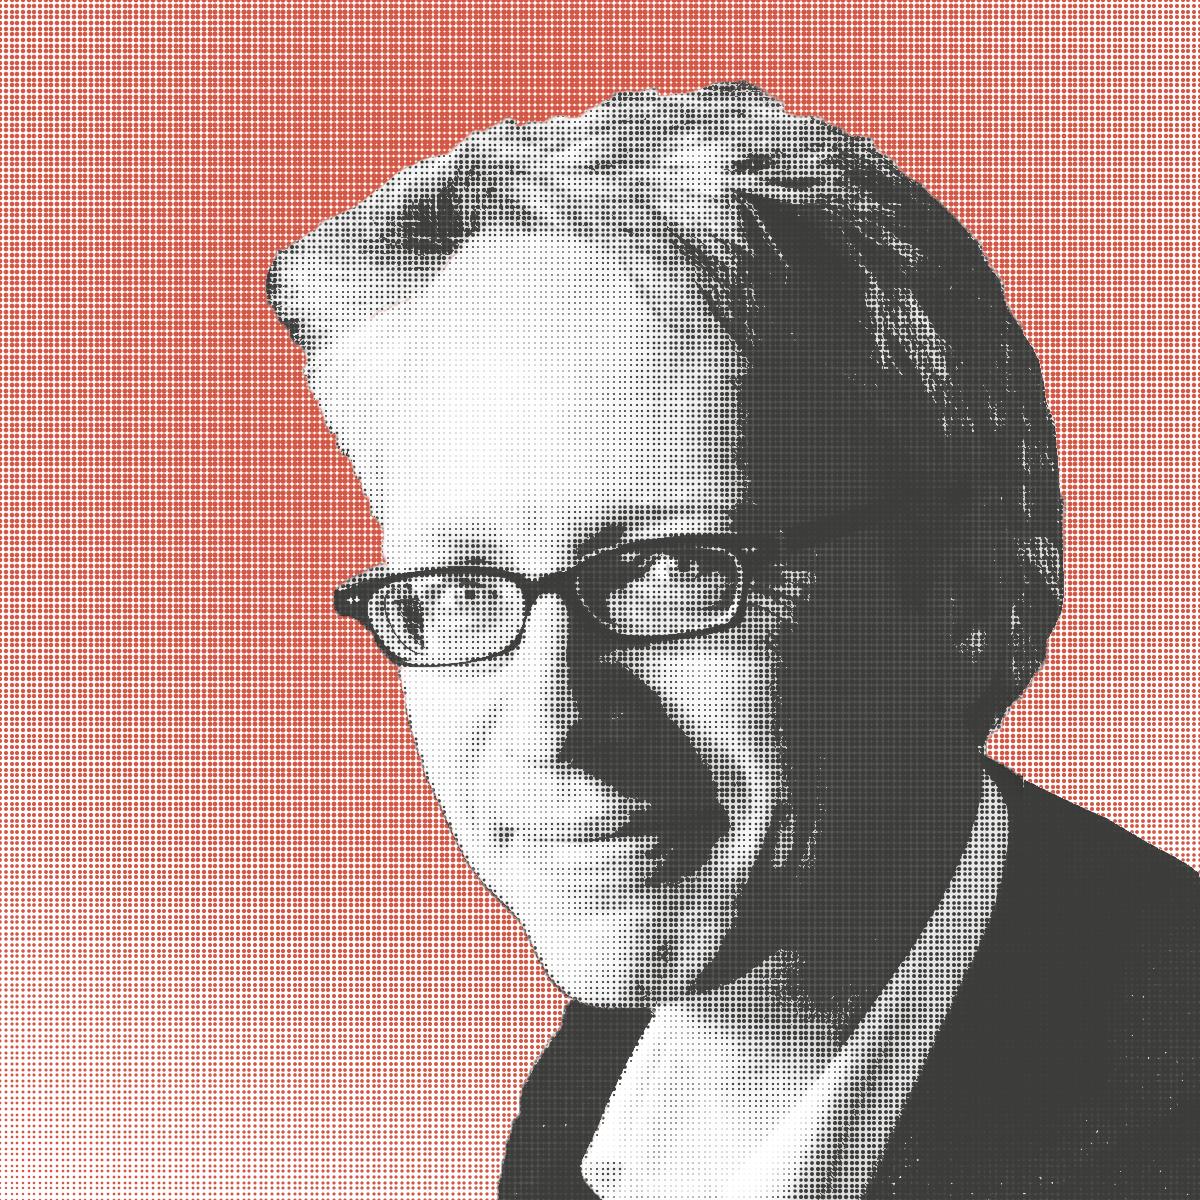 Peter Oliver Loew